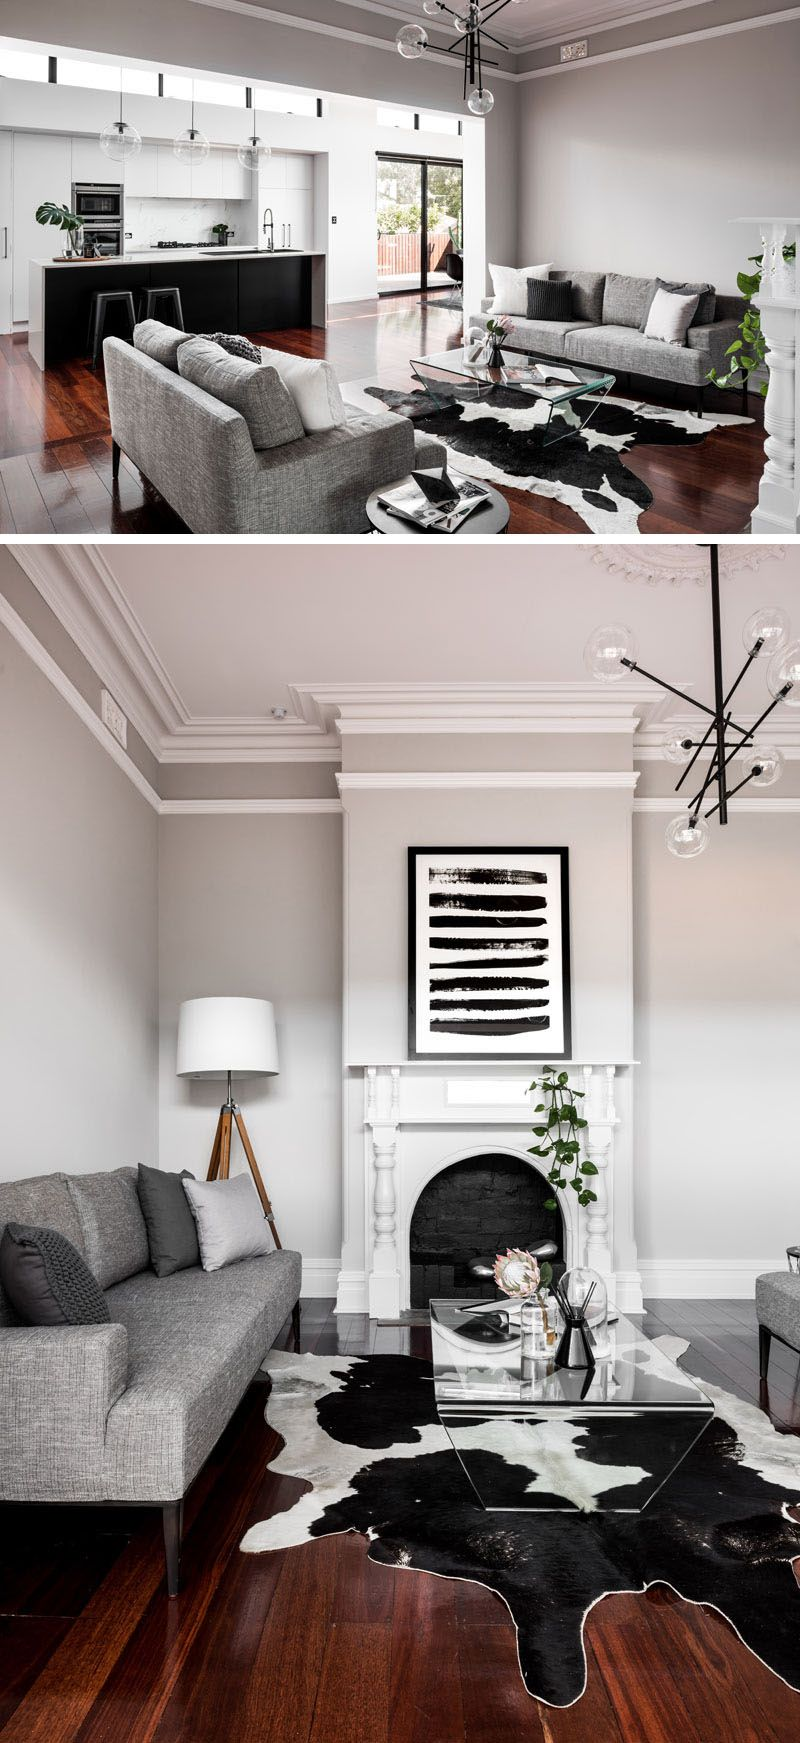 Medium Crop Of Home Design Elements